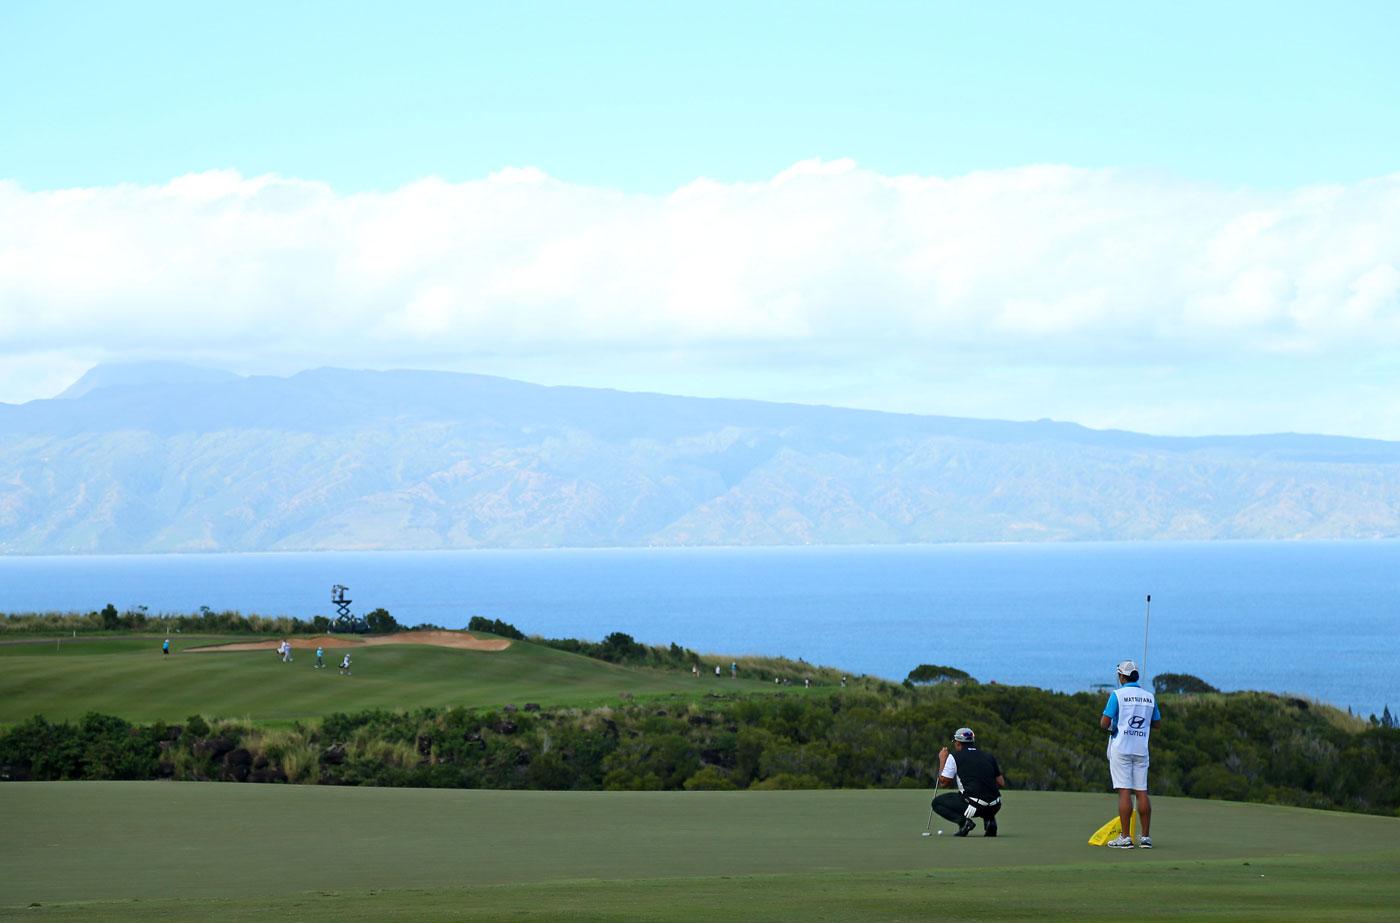 Hideki Matsuyama lines up a putt on the fifth green.